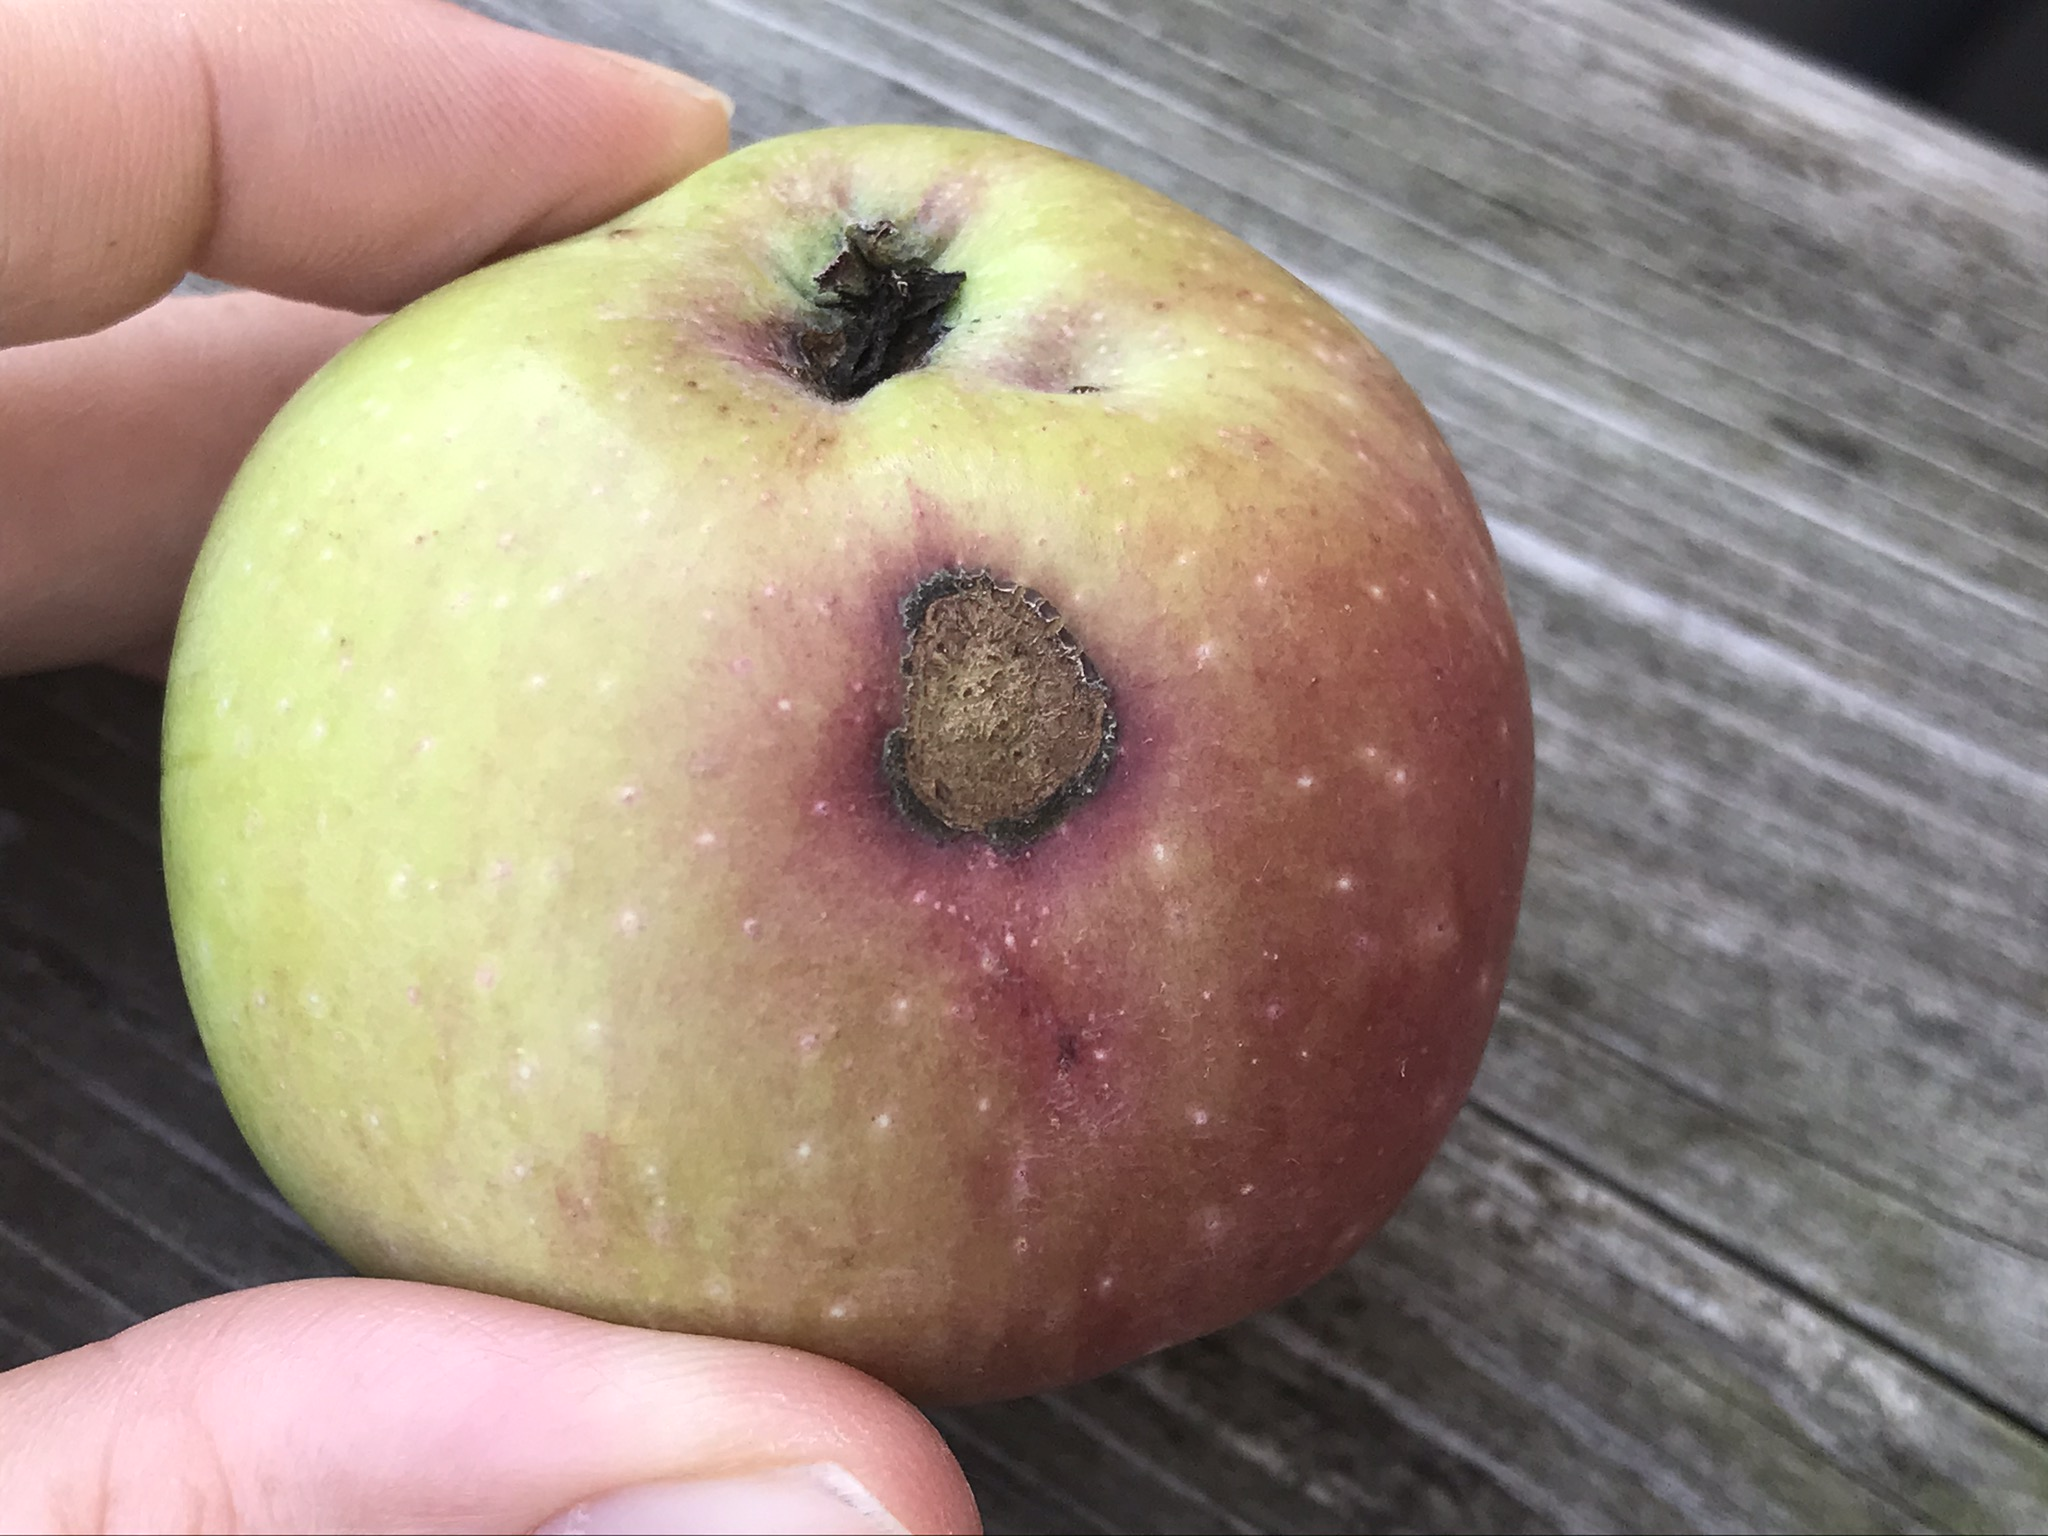 Apple scab lesion on fruit.